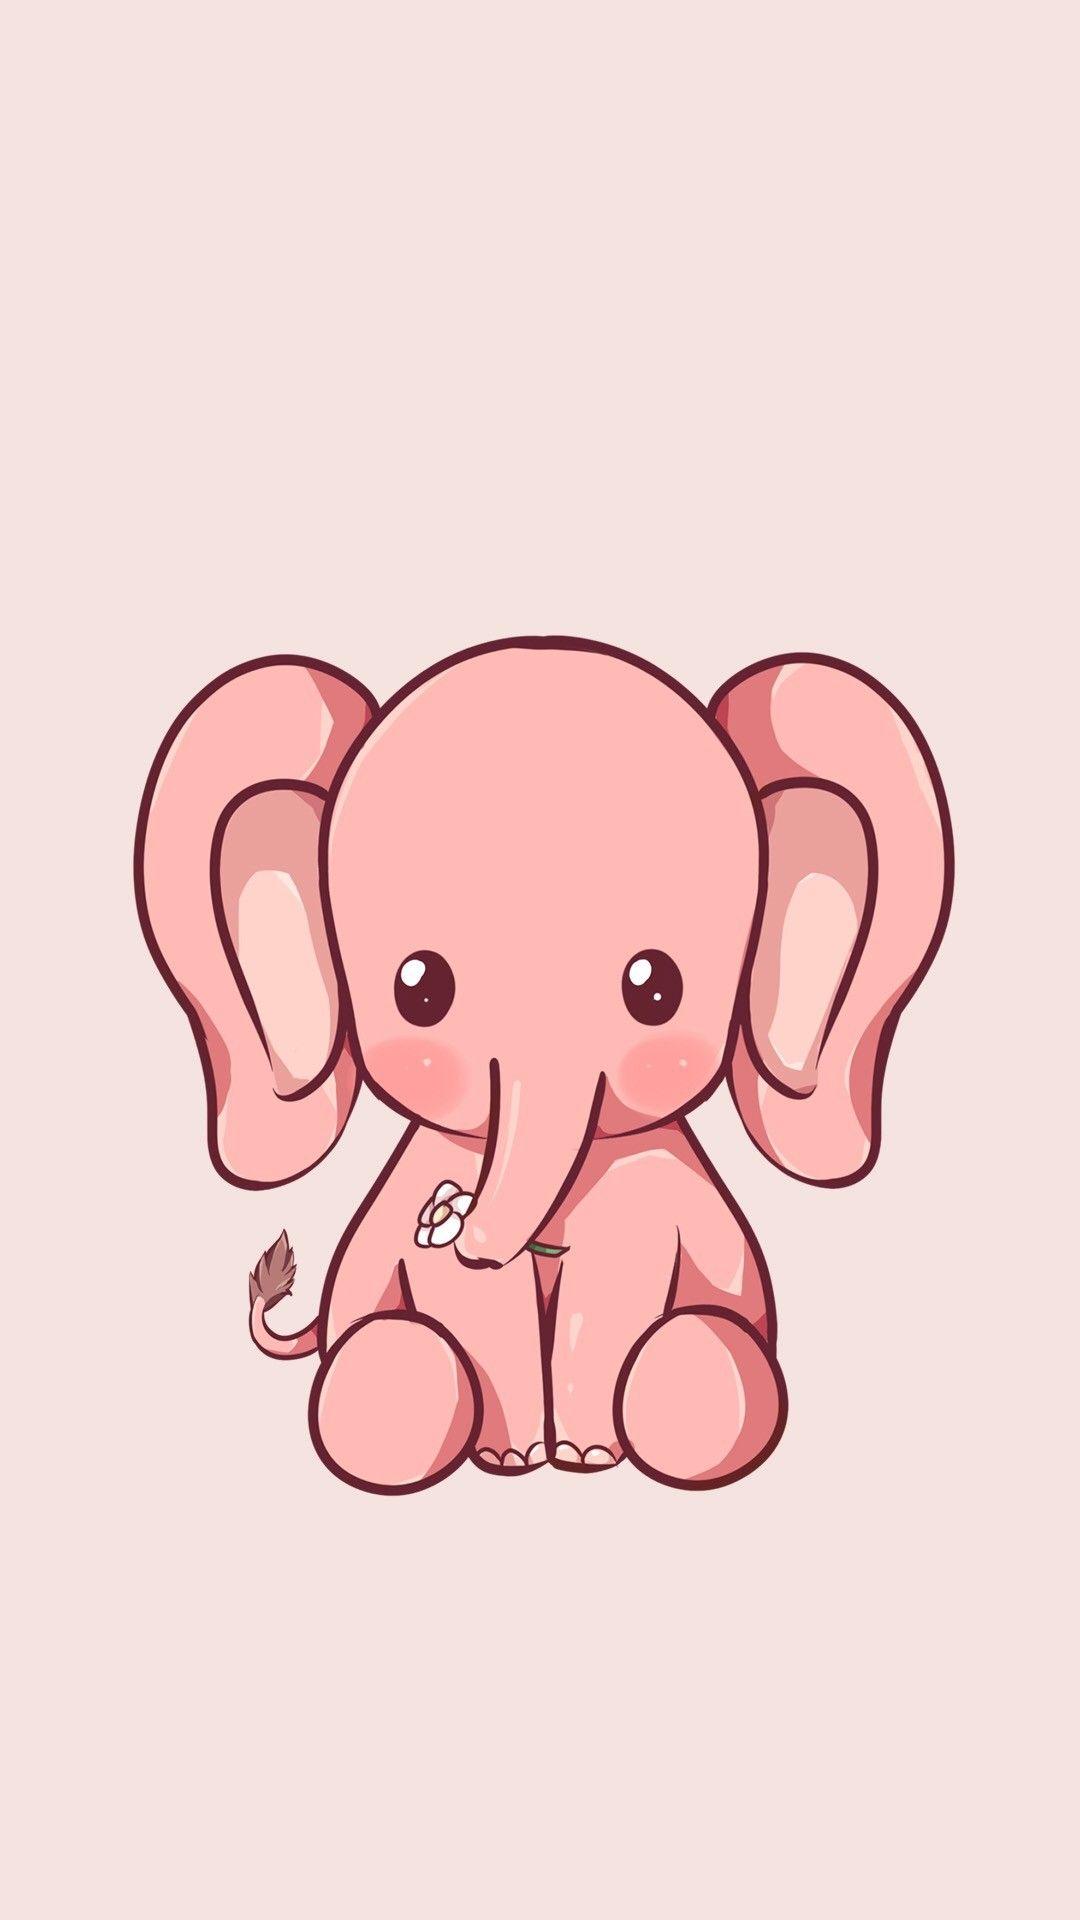 Pin By Mai Mauraa Download Wallpape On Cute Wallpapers Elephant Iphone Wallpaper Wallpaper Iphone Cute Cute Elephant Cartoon